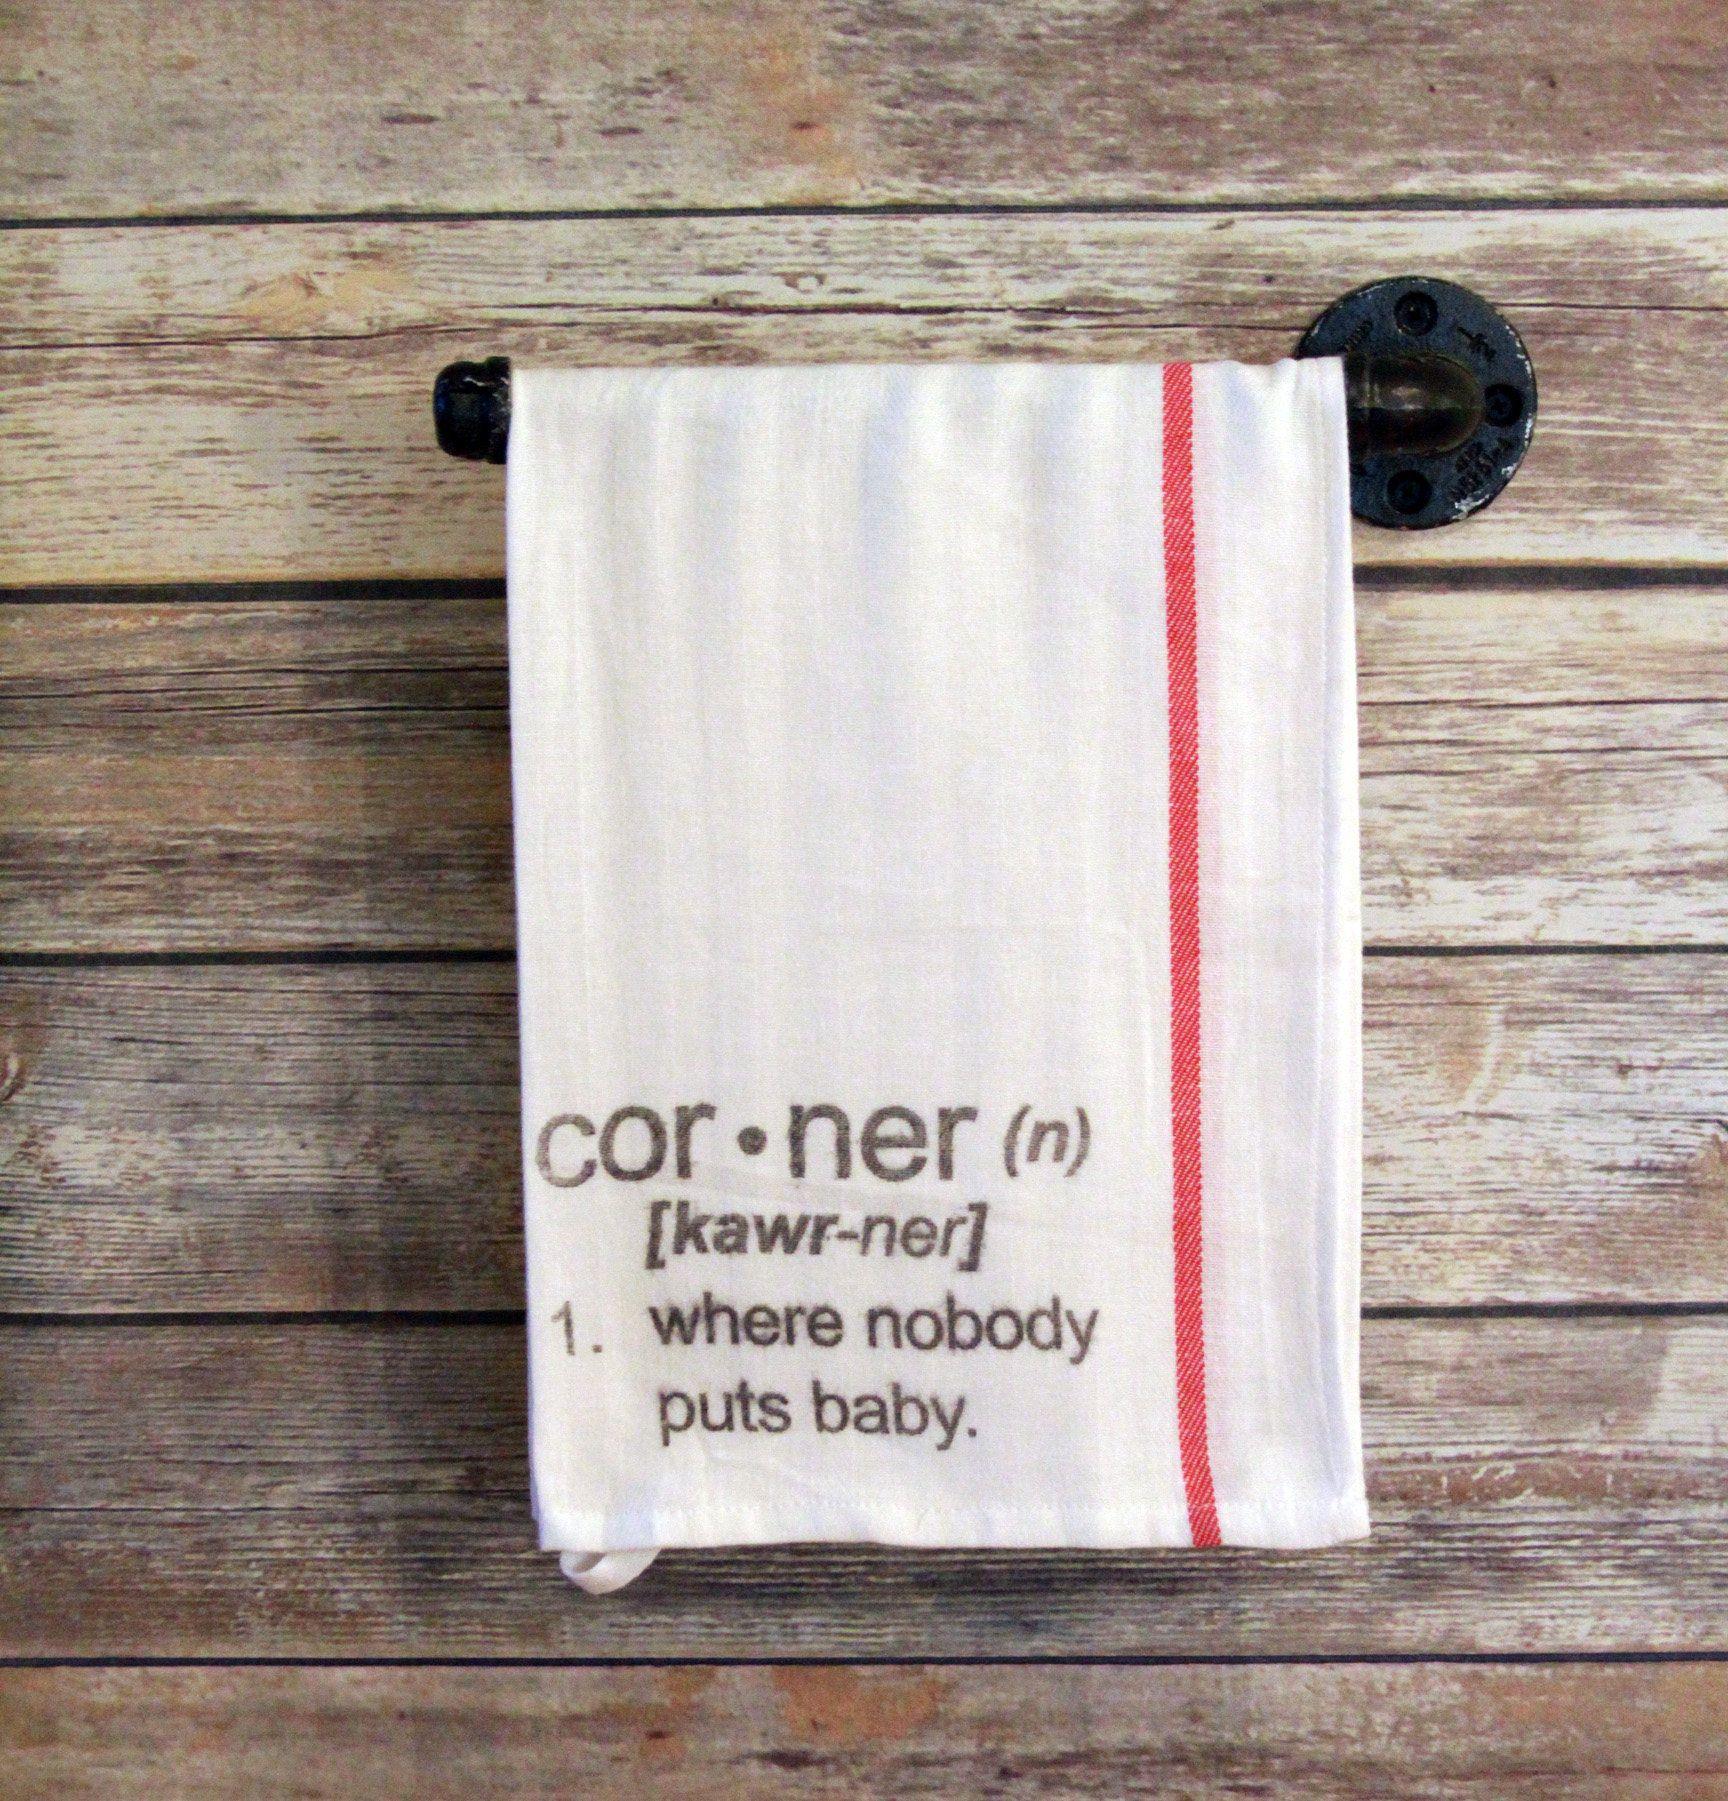 Corner, Funny Dish Towel, Tea Towel, Hanging Kitchen Towel, Home